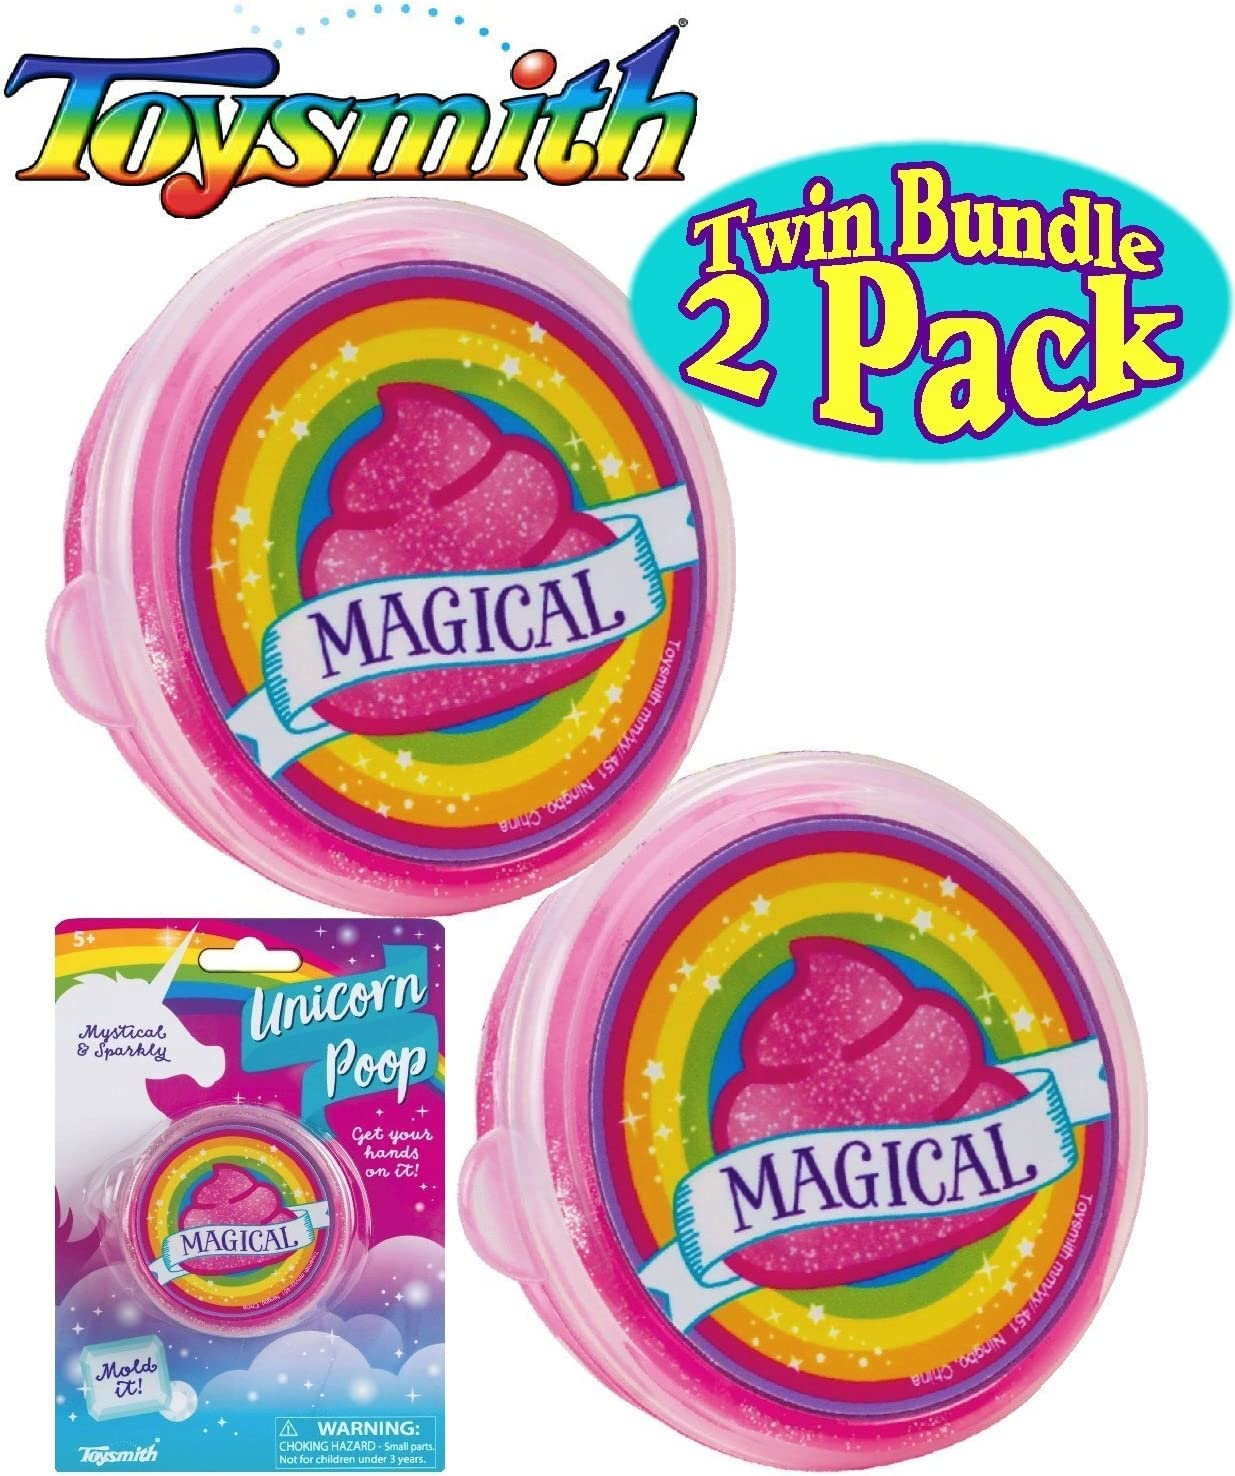 Mɑttys Toy Stop Toysmith Grow-A-Unicorn Gift Set Bundle 2 Pack